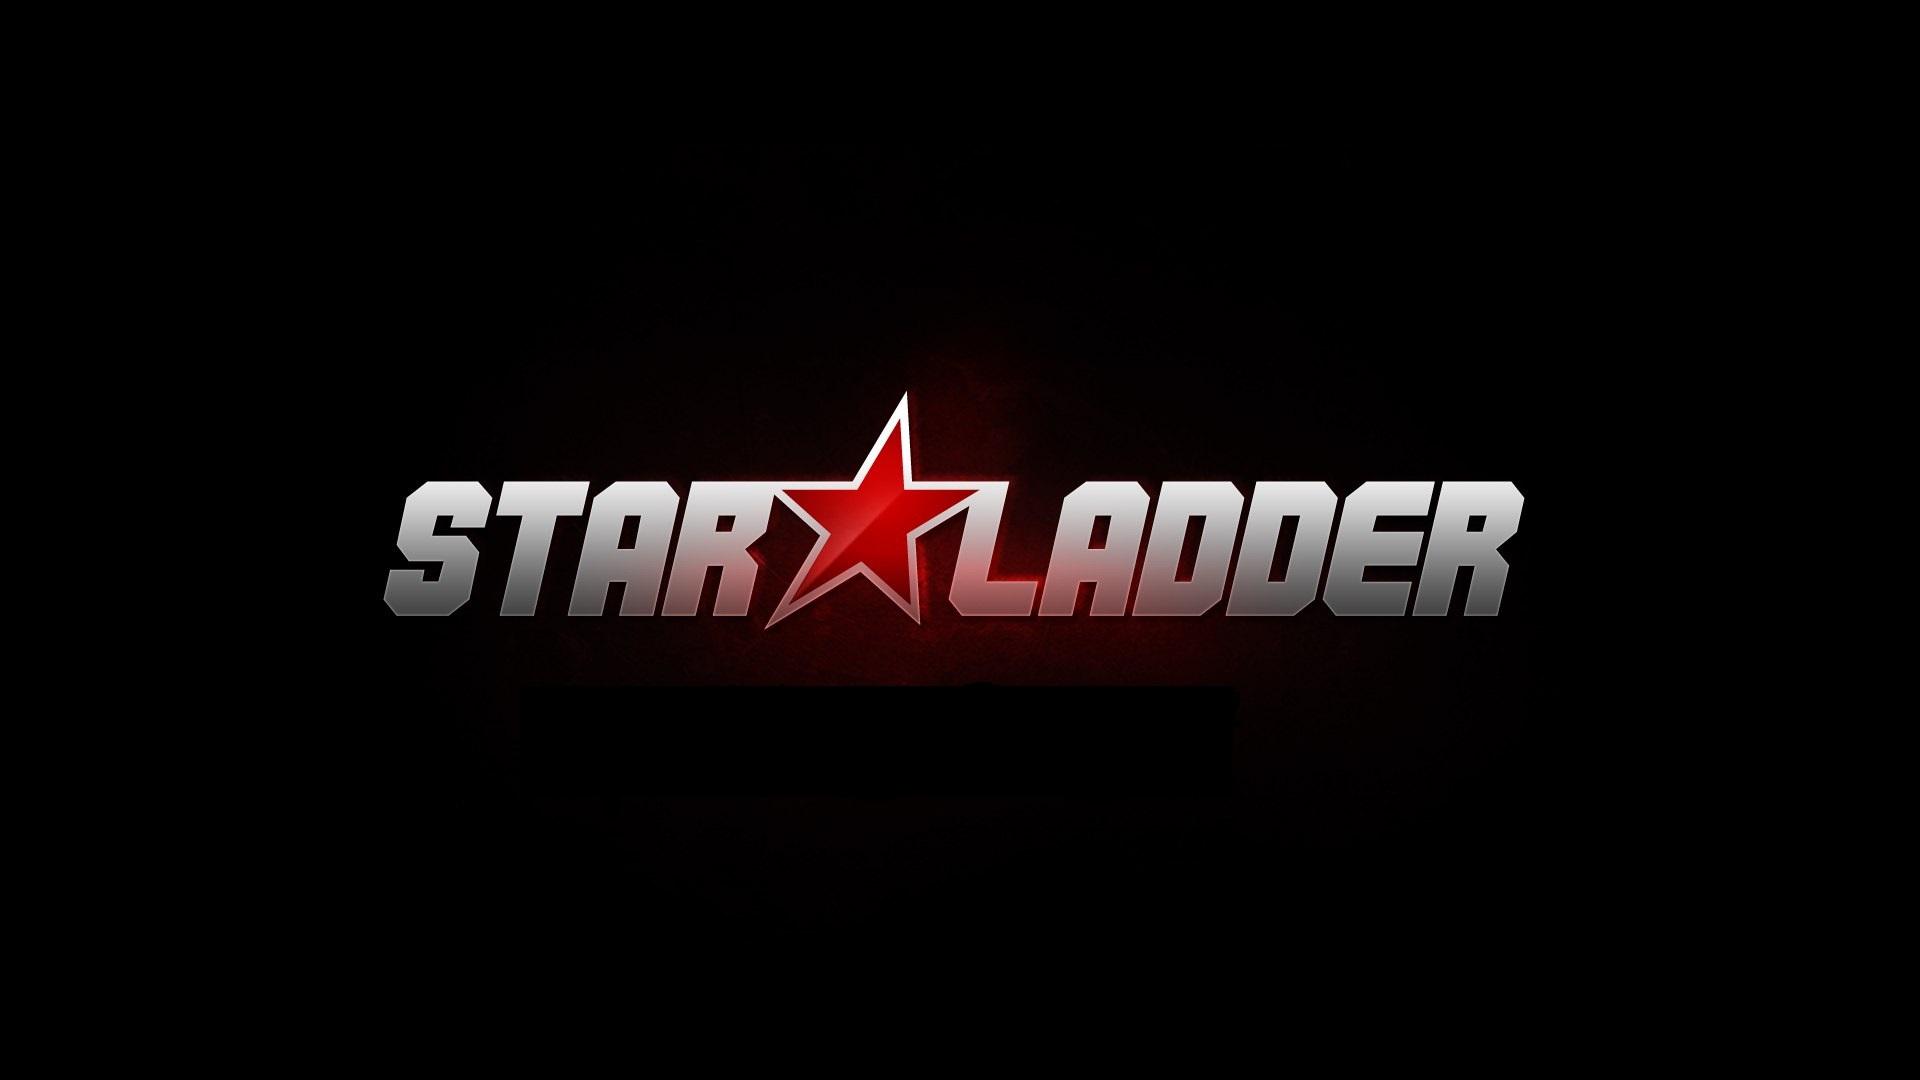 Starladder season 8 csgo steam ключи купить